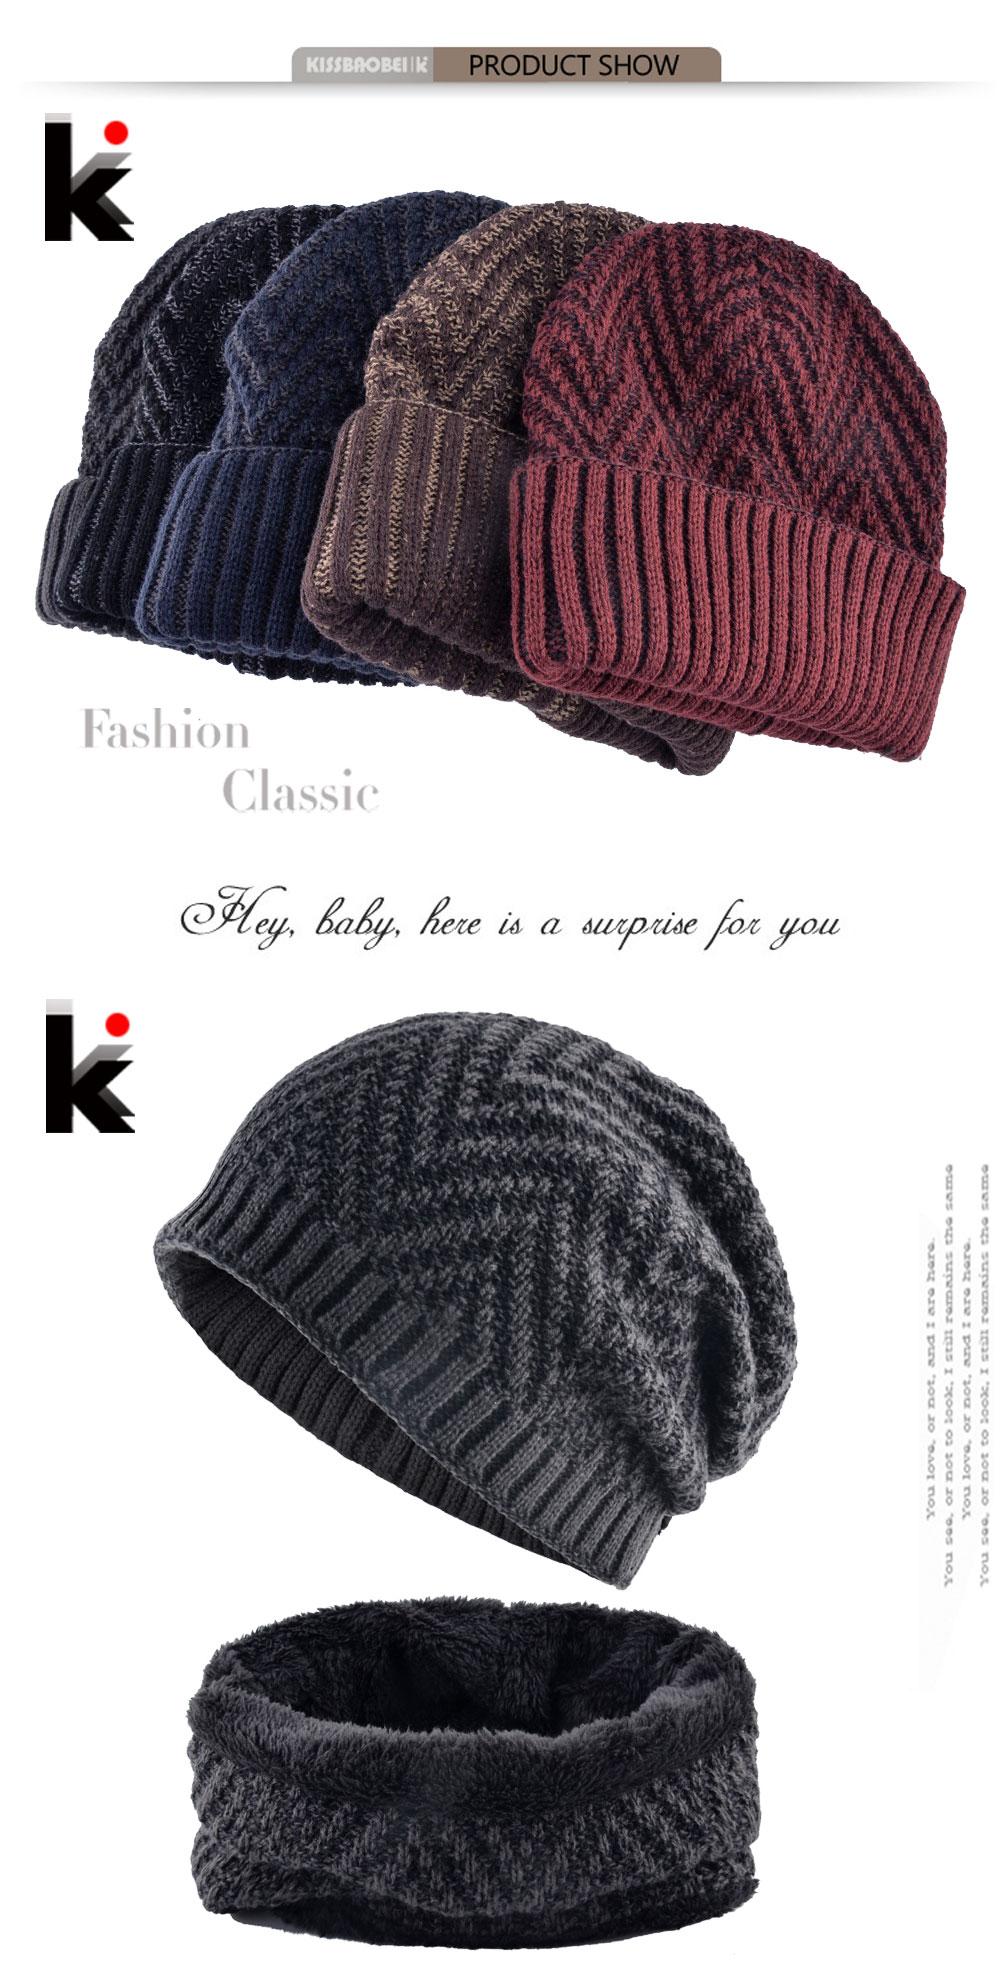 cf9947d570c Men s Hat And Scarf Sets Winter Knitted Thick Bonnet Caps Men Add Velvet  Beanies Hats Scarves Set Knitting Warm Skullies Gorro